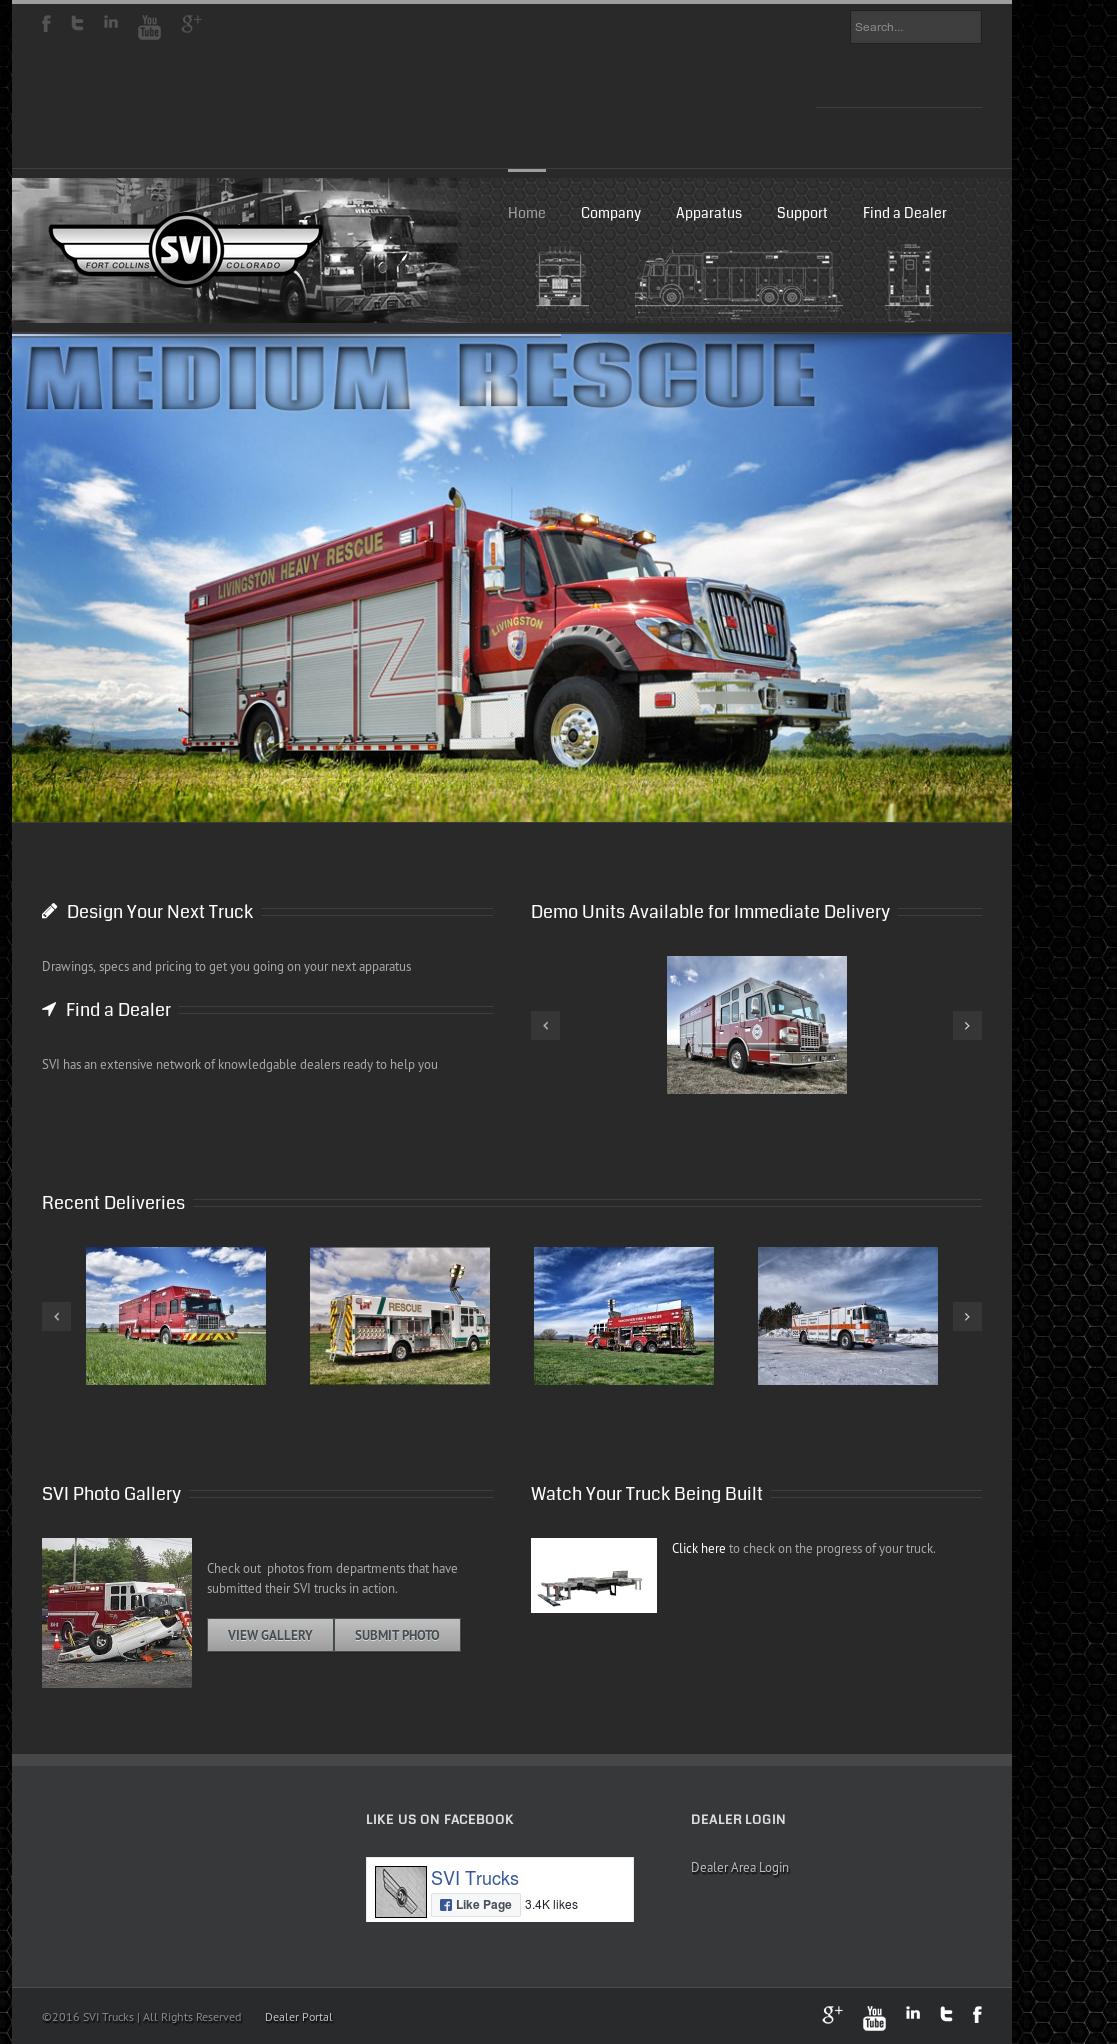 SVI Trucks petitors Revenue and Employees Owler pany Profile